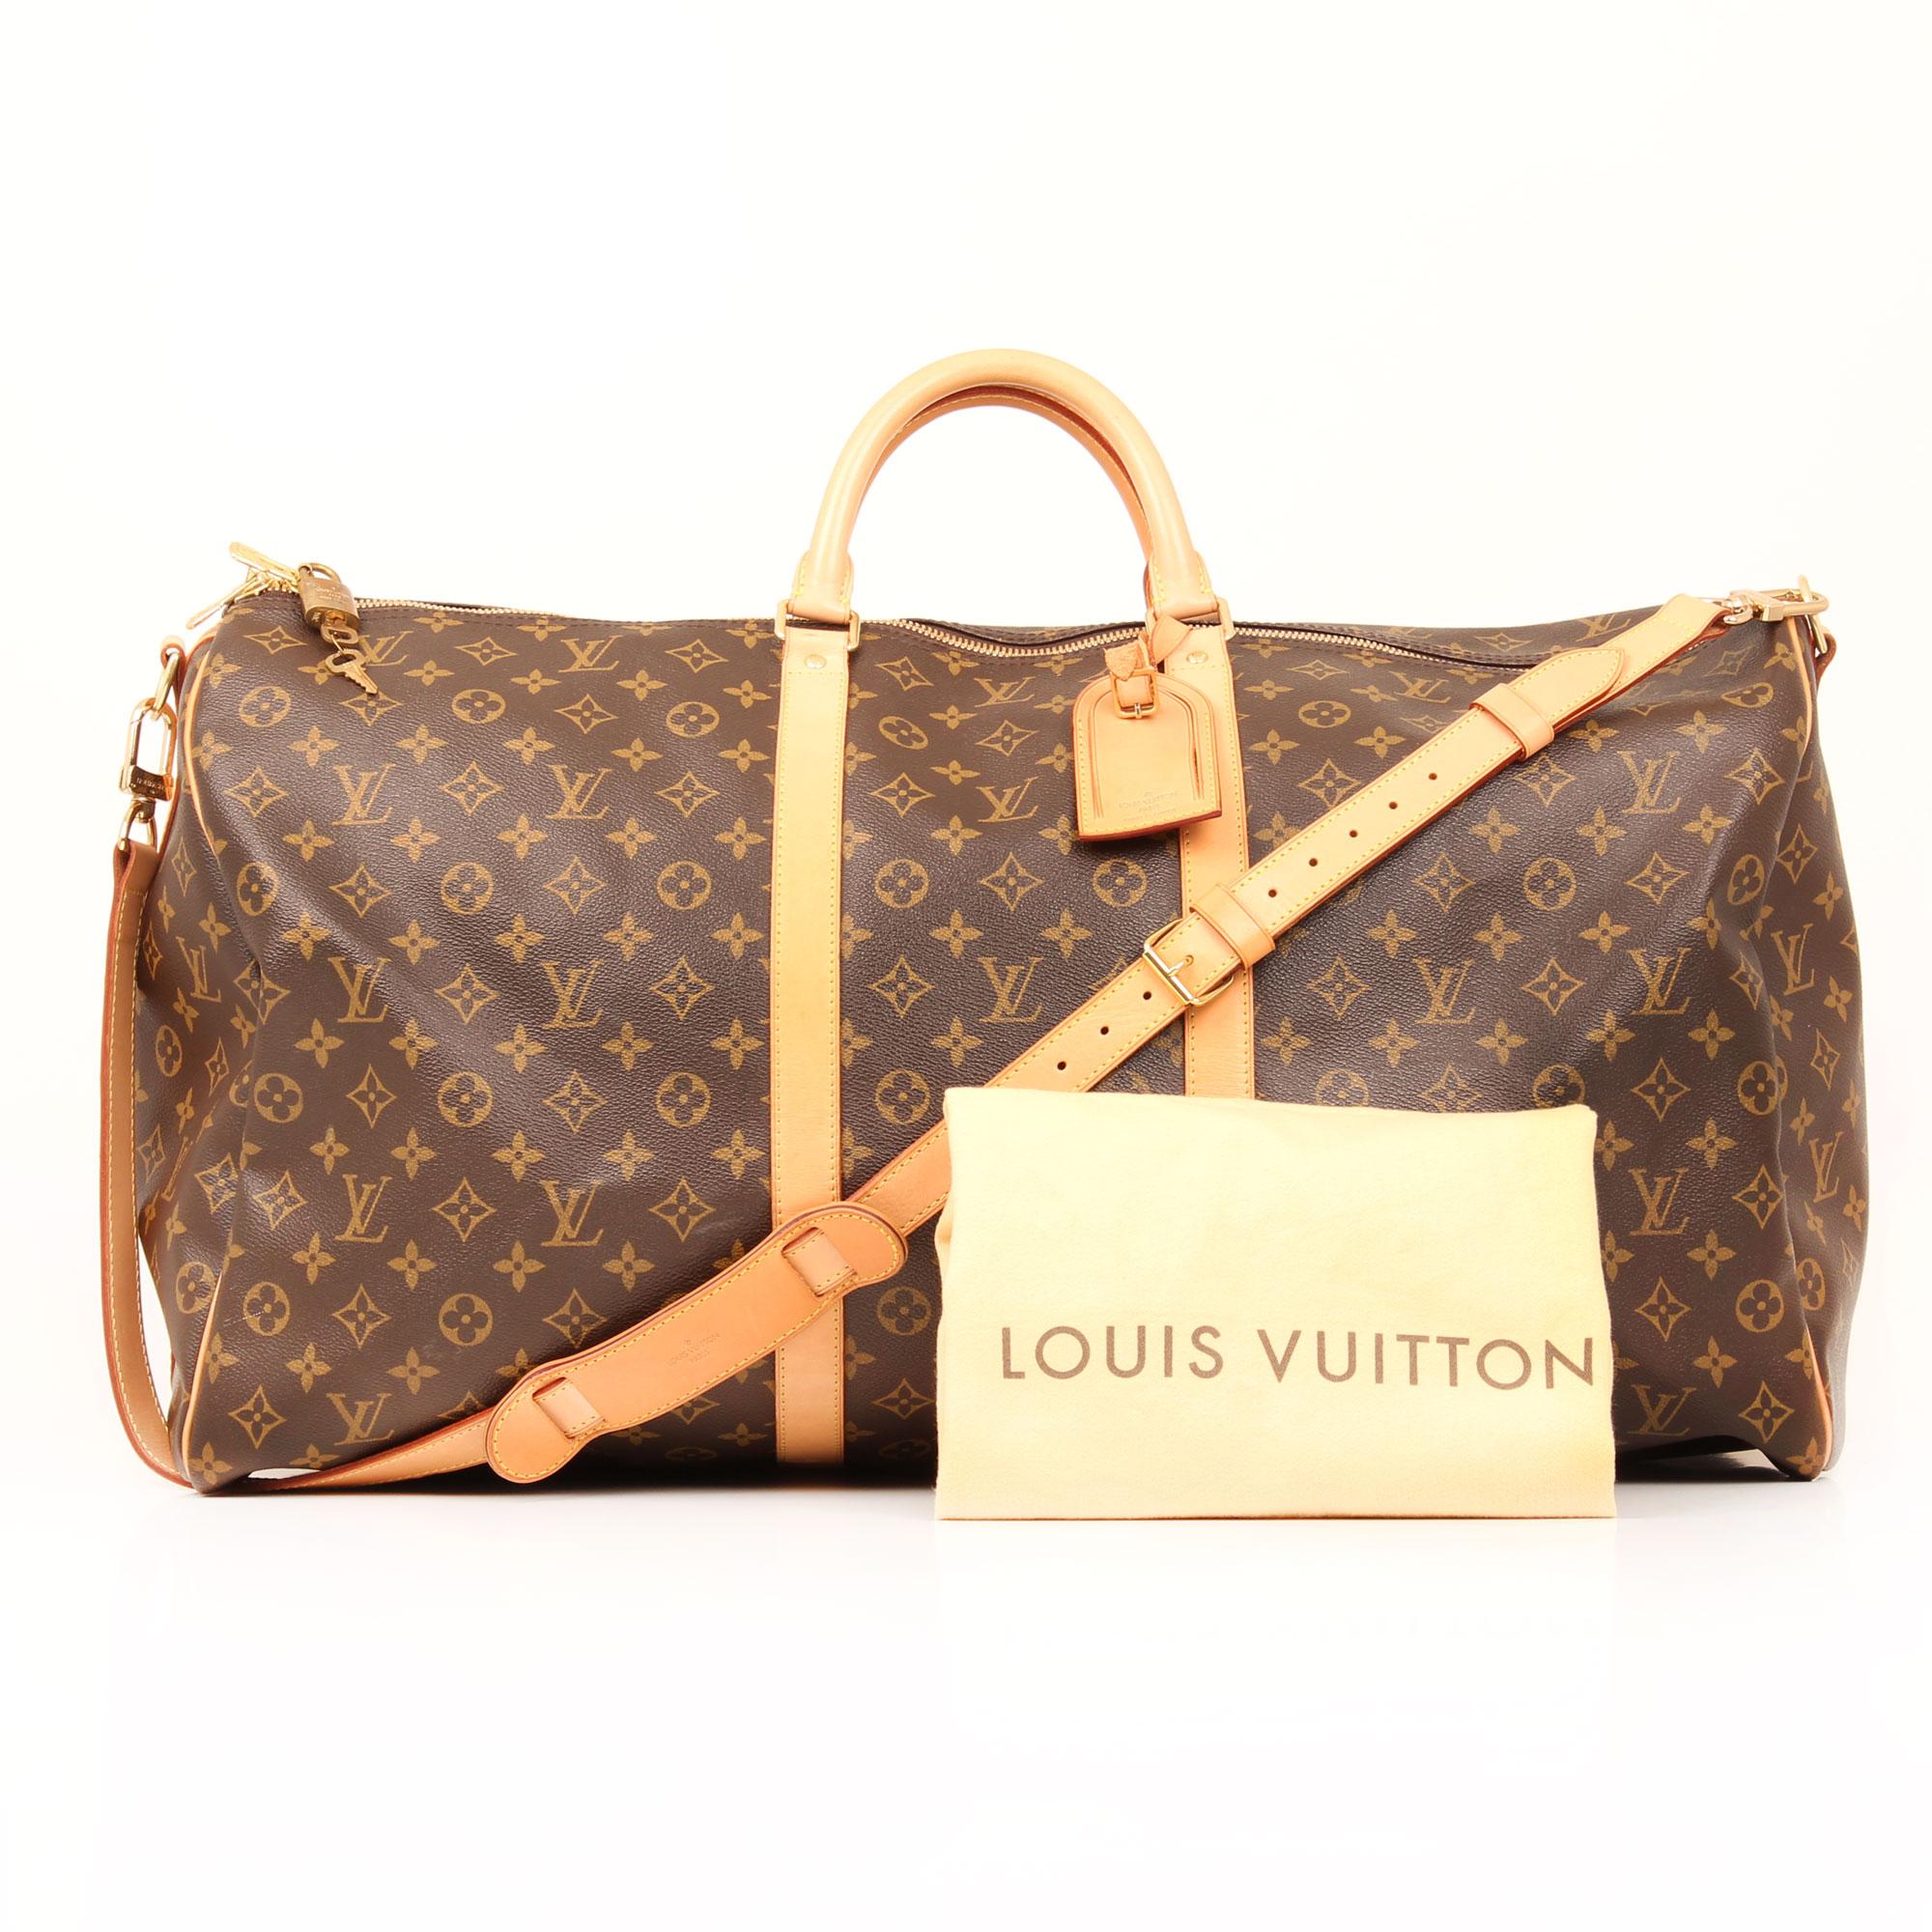 travel-bag-louis-vuitton-keepall-60-monogram-dustbag